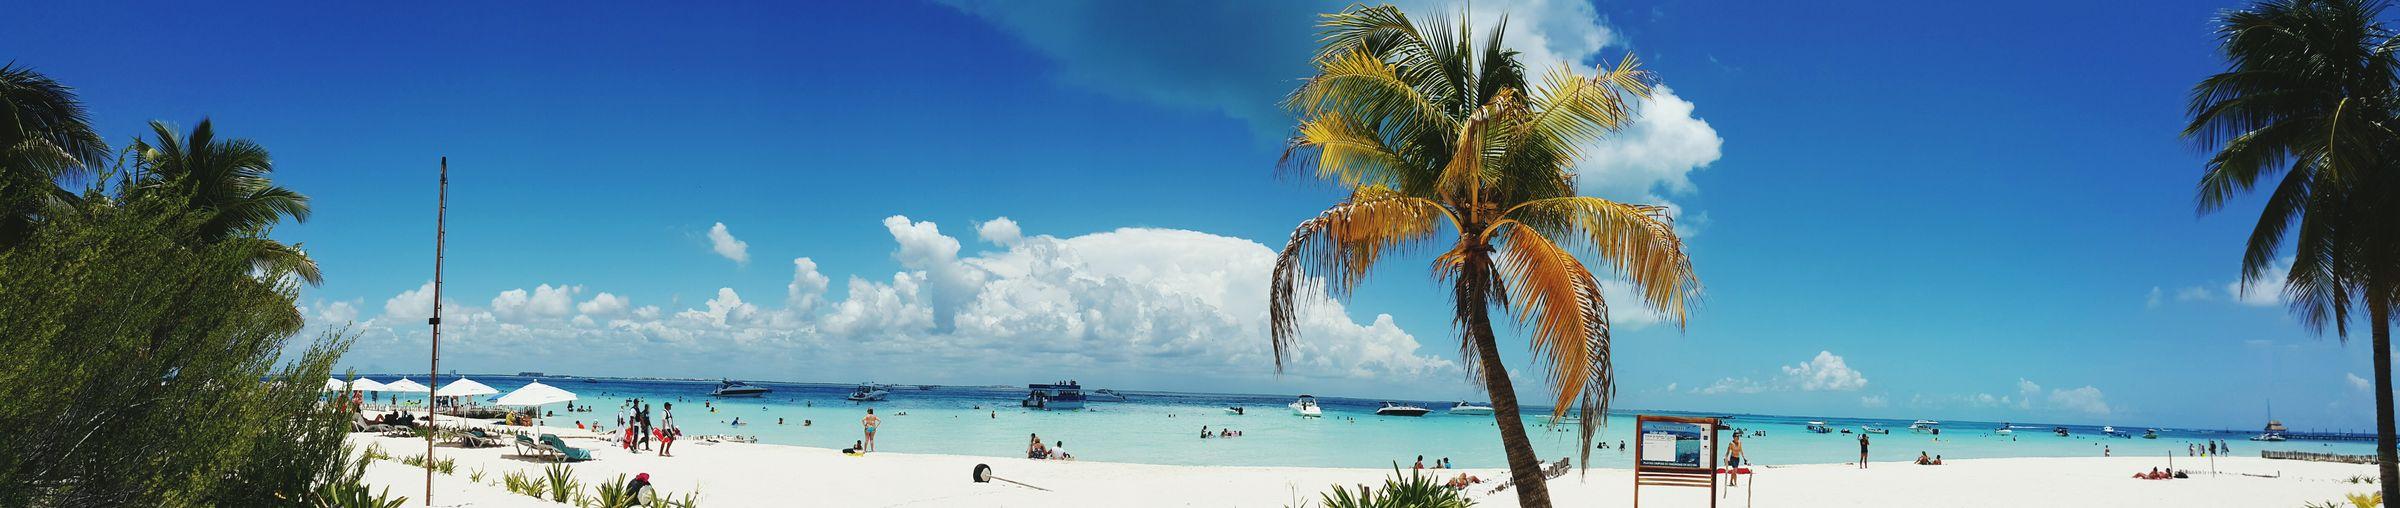 Hanging Out Relaxing Enjoying Life En Isla Mujeres...una maravilla más de Quintanaroo Mexico First Eyeem Photo